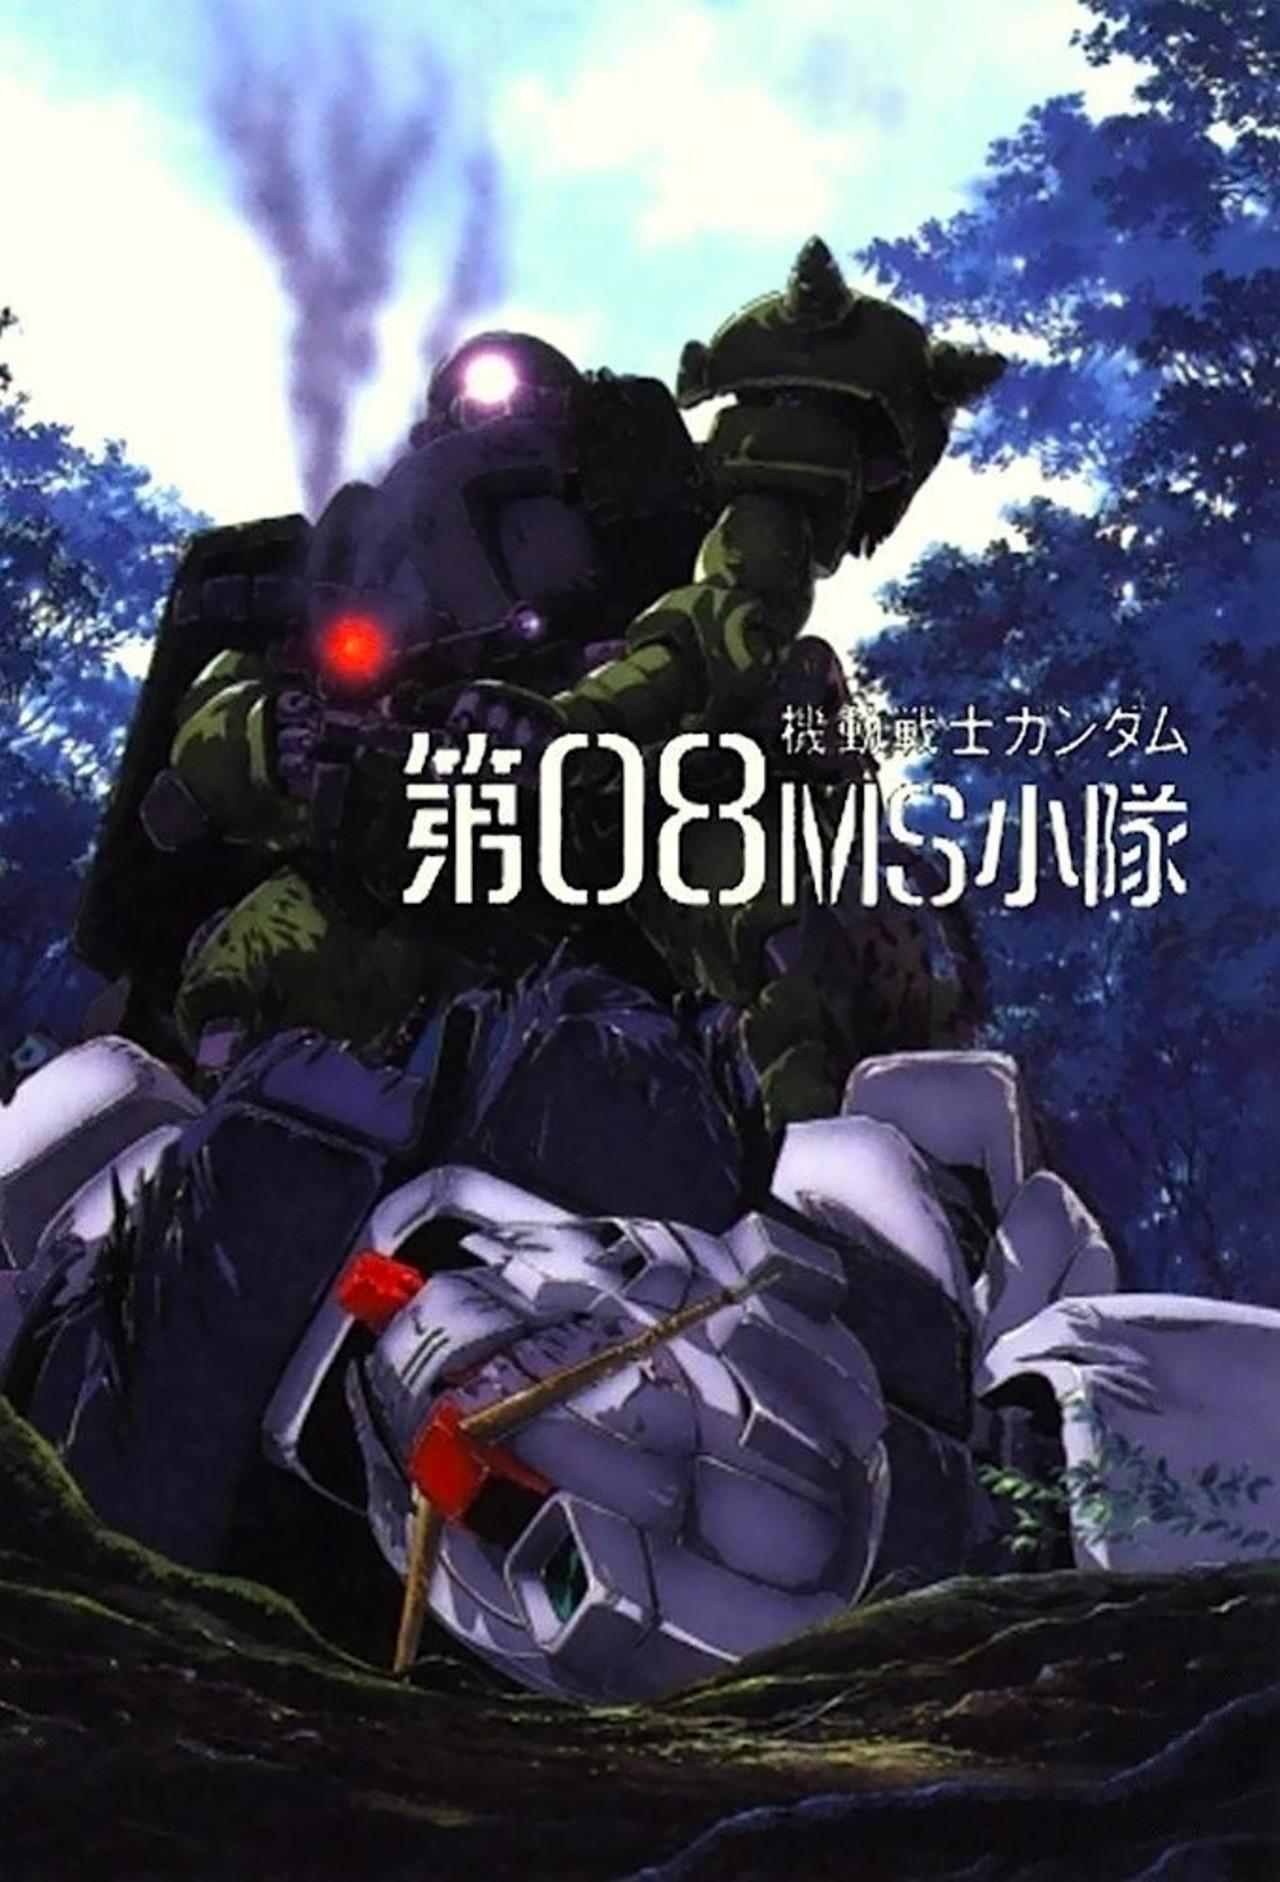 Mobile Suit Gundam: The 08th MS Team kapak